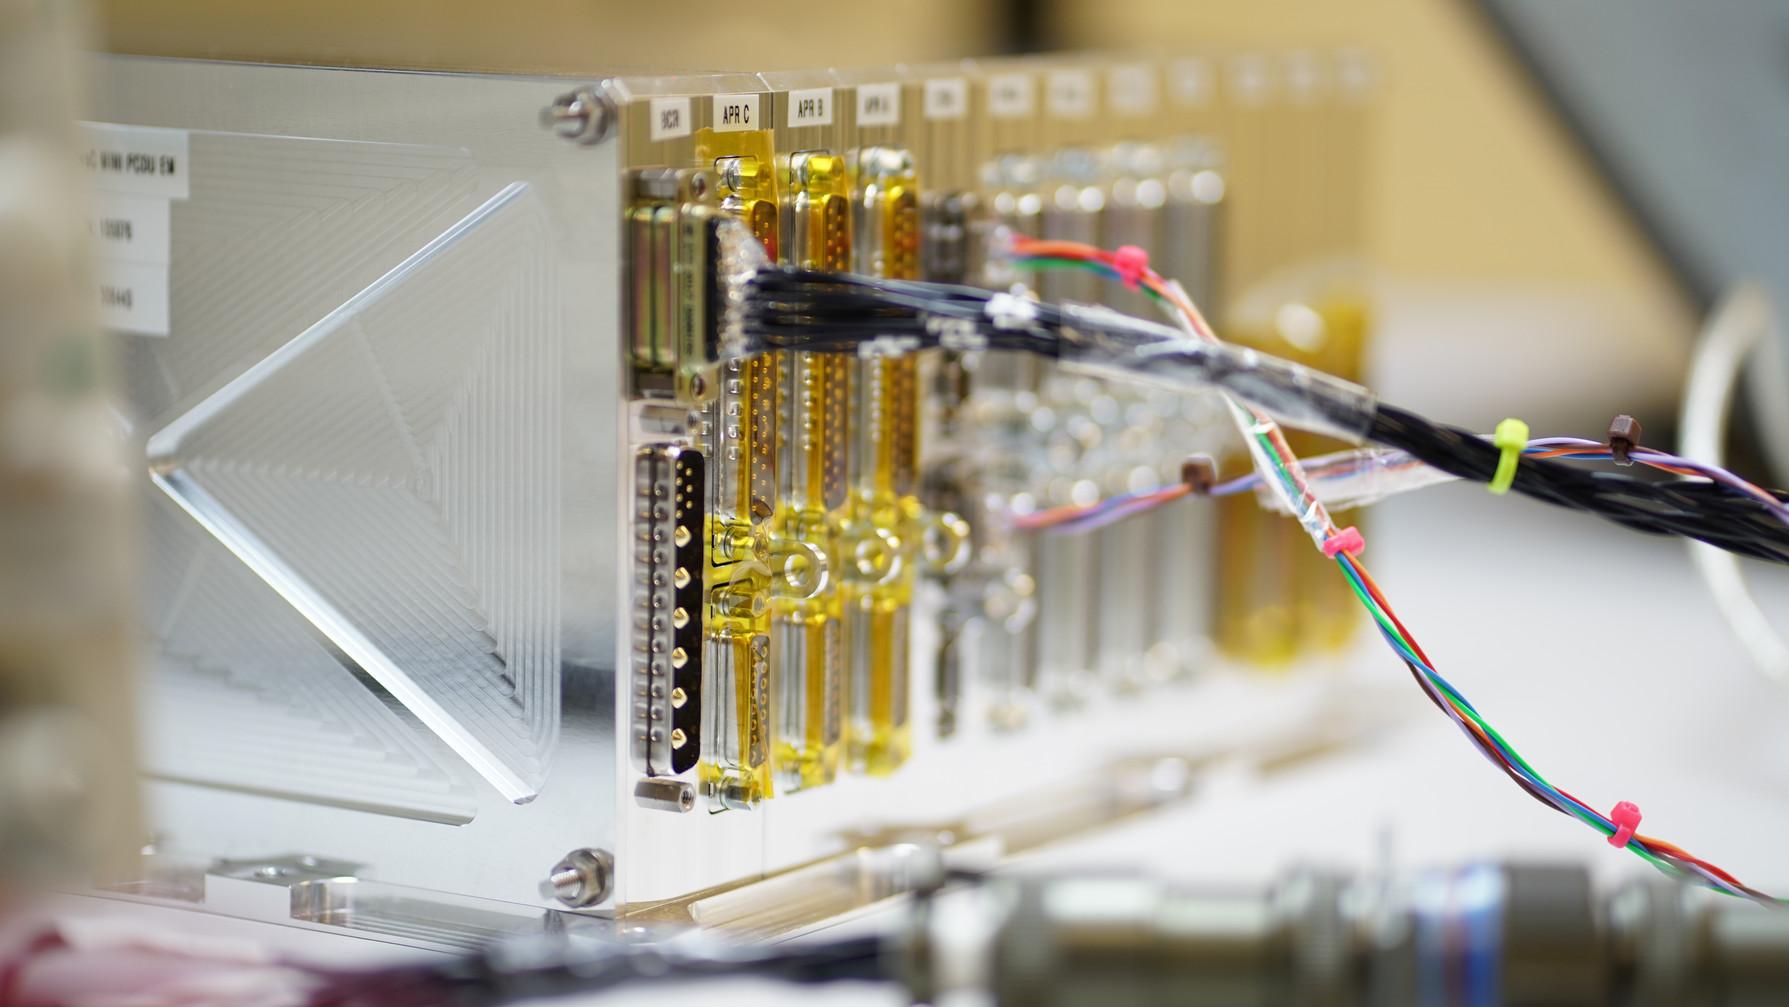 IM-1 Power Control Distribution Unit